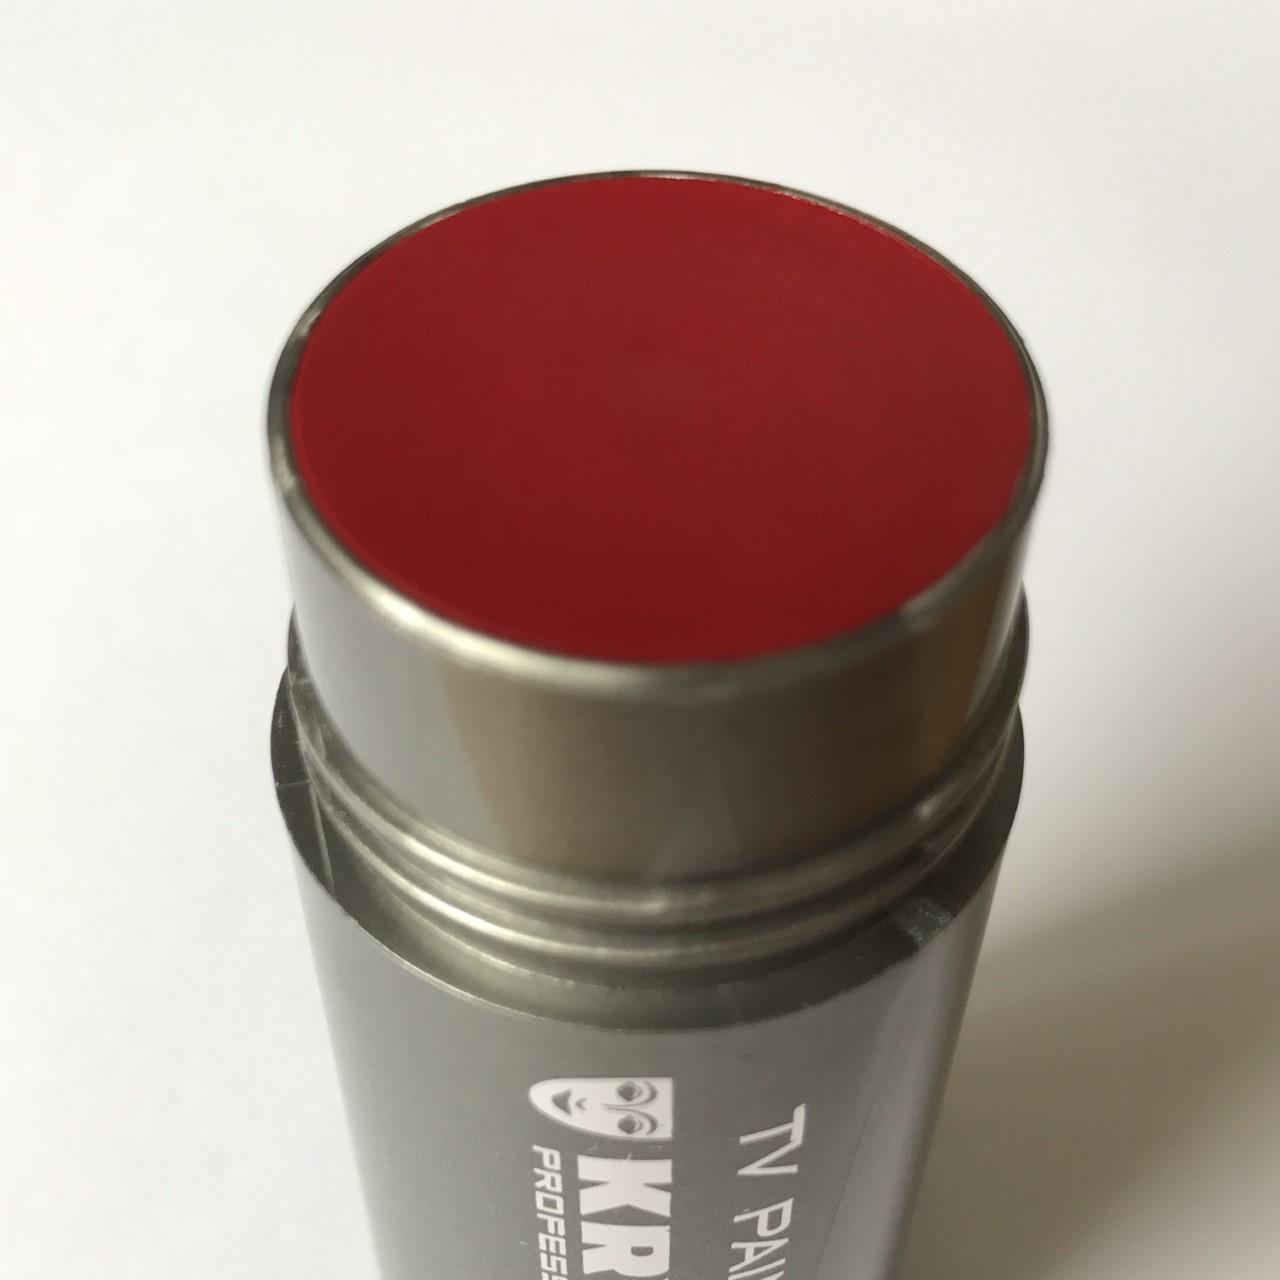 Maquillage kryolan paint stick 5047 w80 rouge